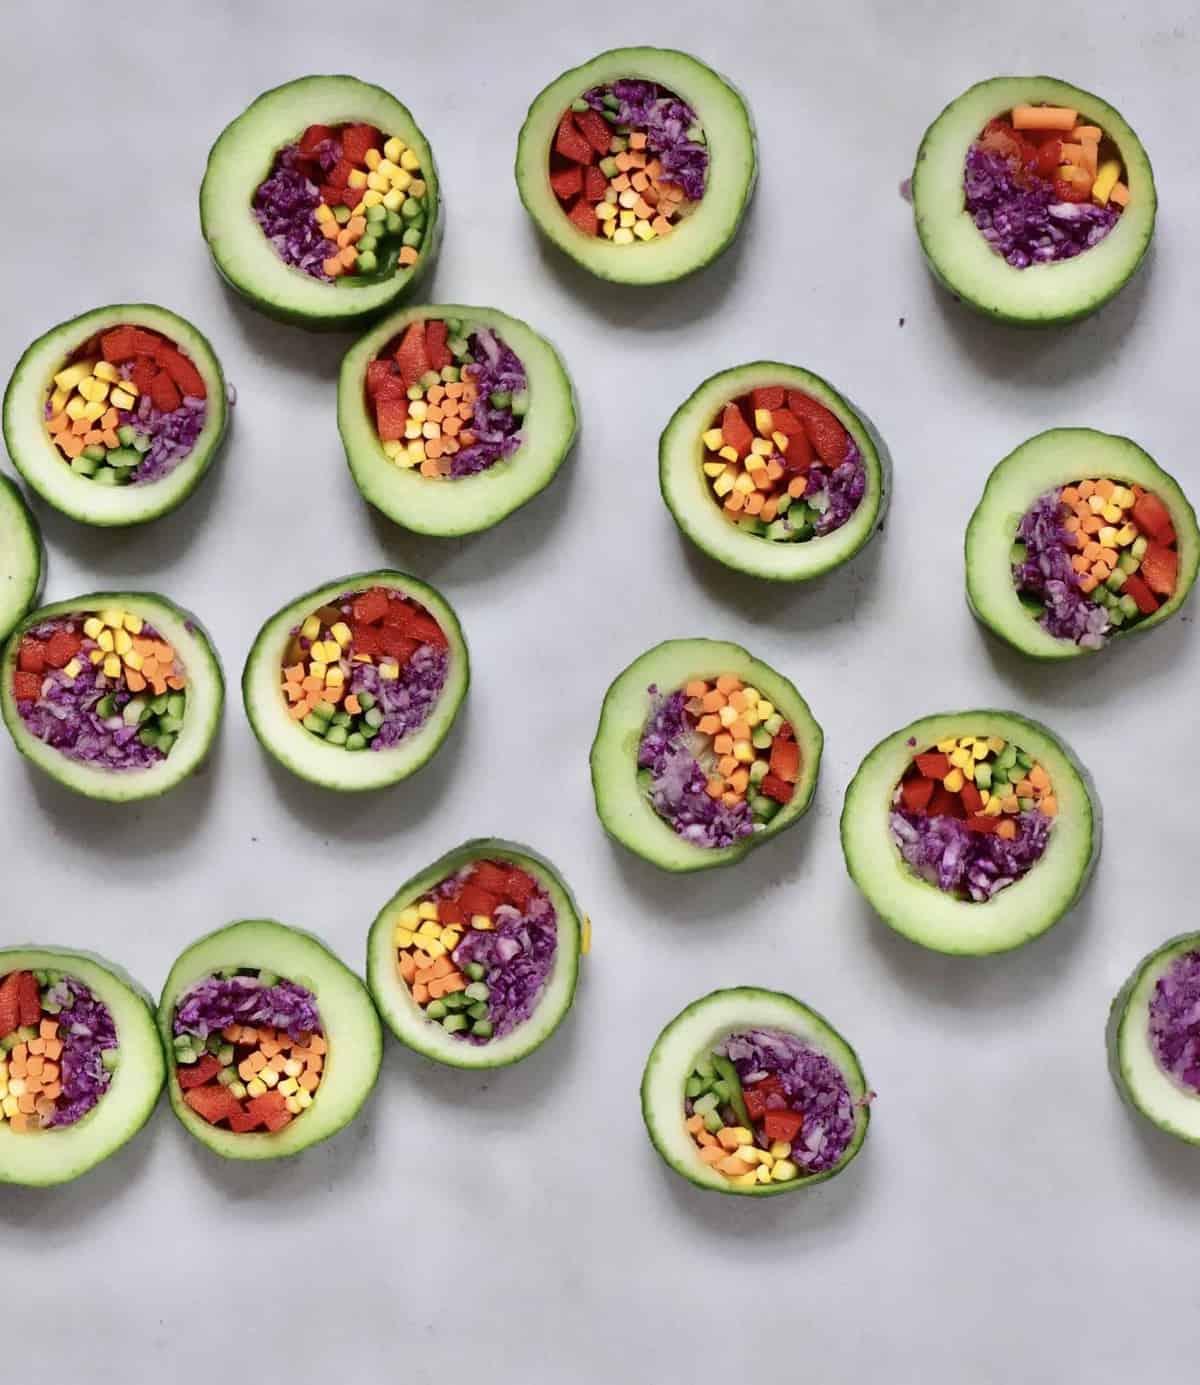 Cucumber sushi cut into rounds